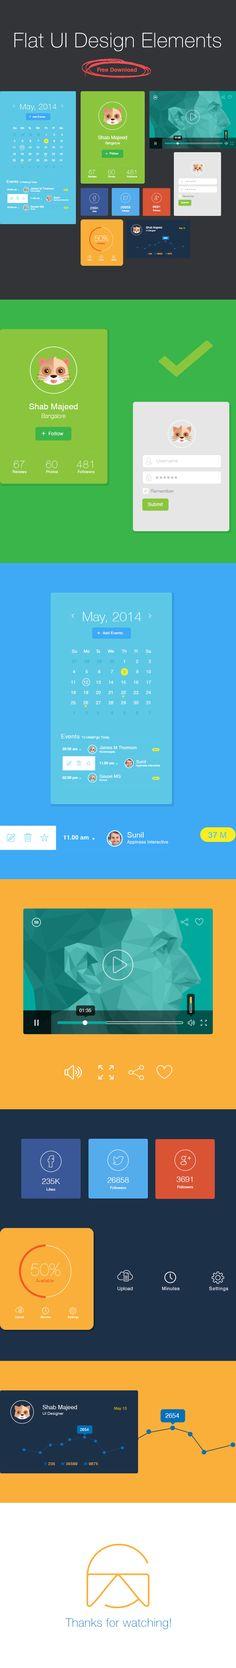 Flat UI Design Elements  – Free Download